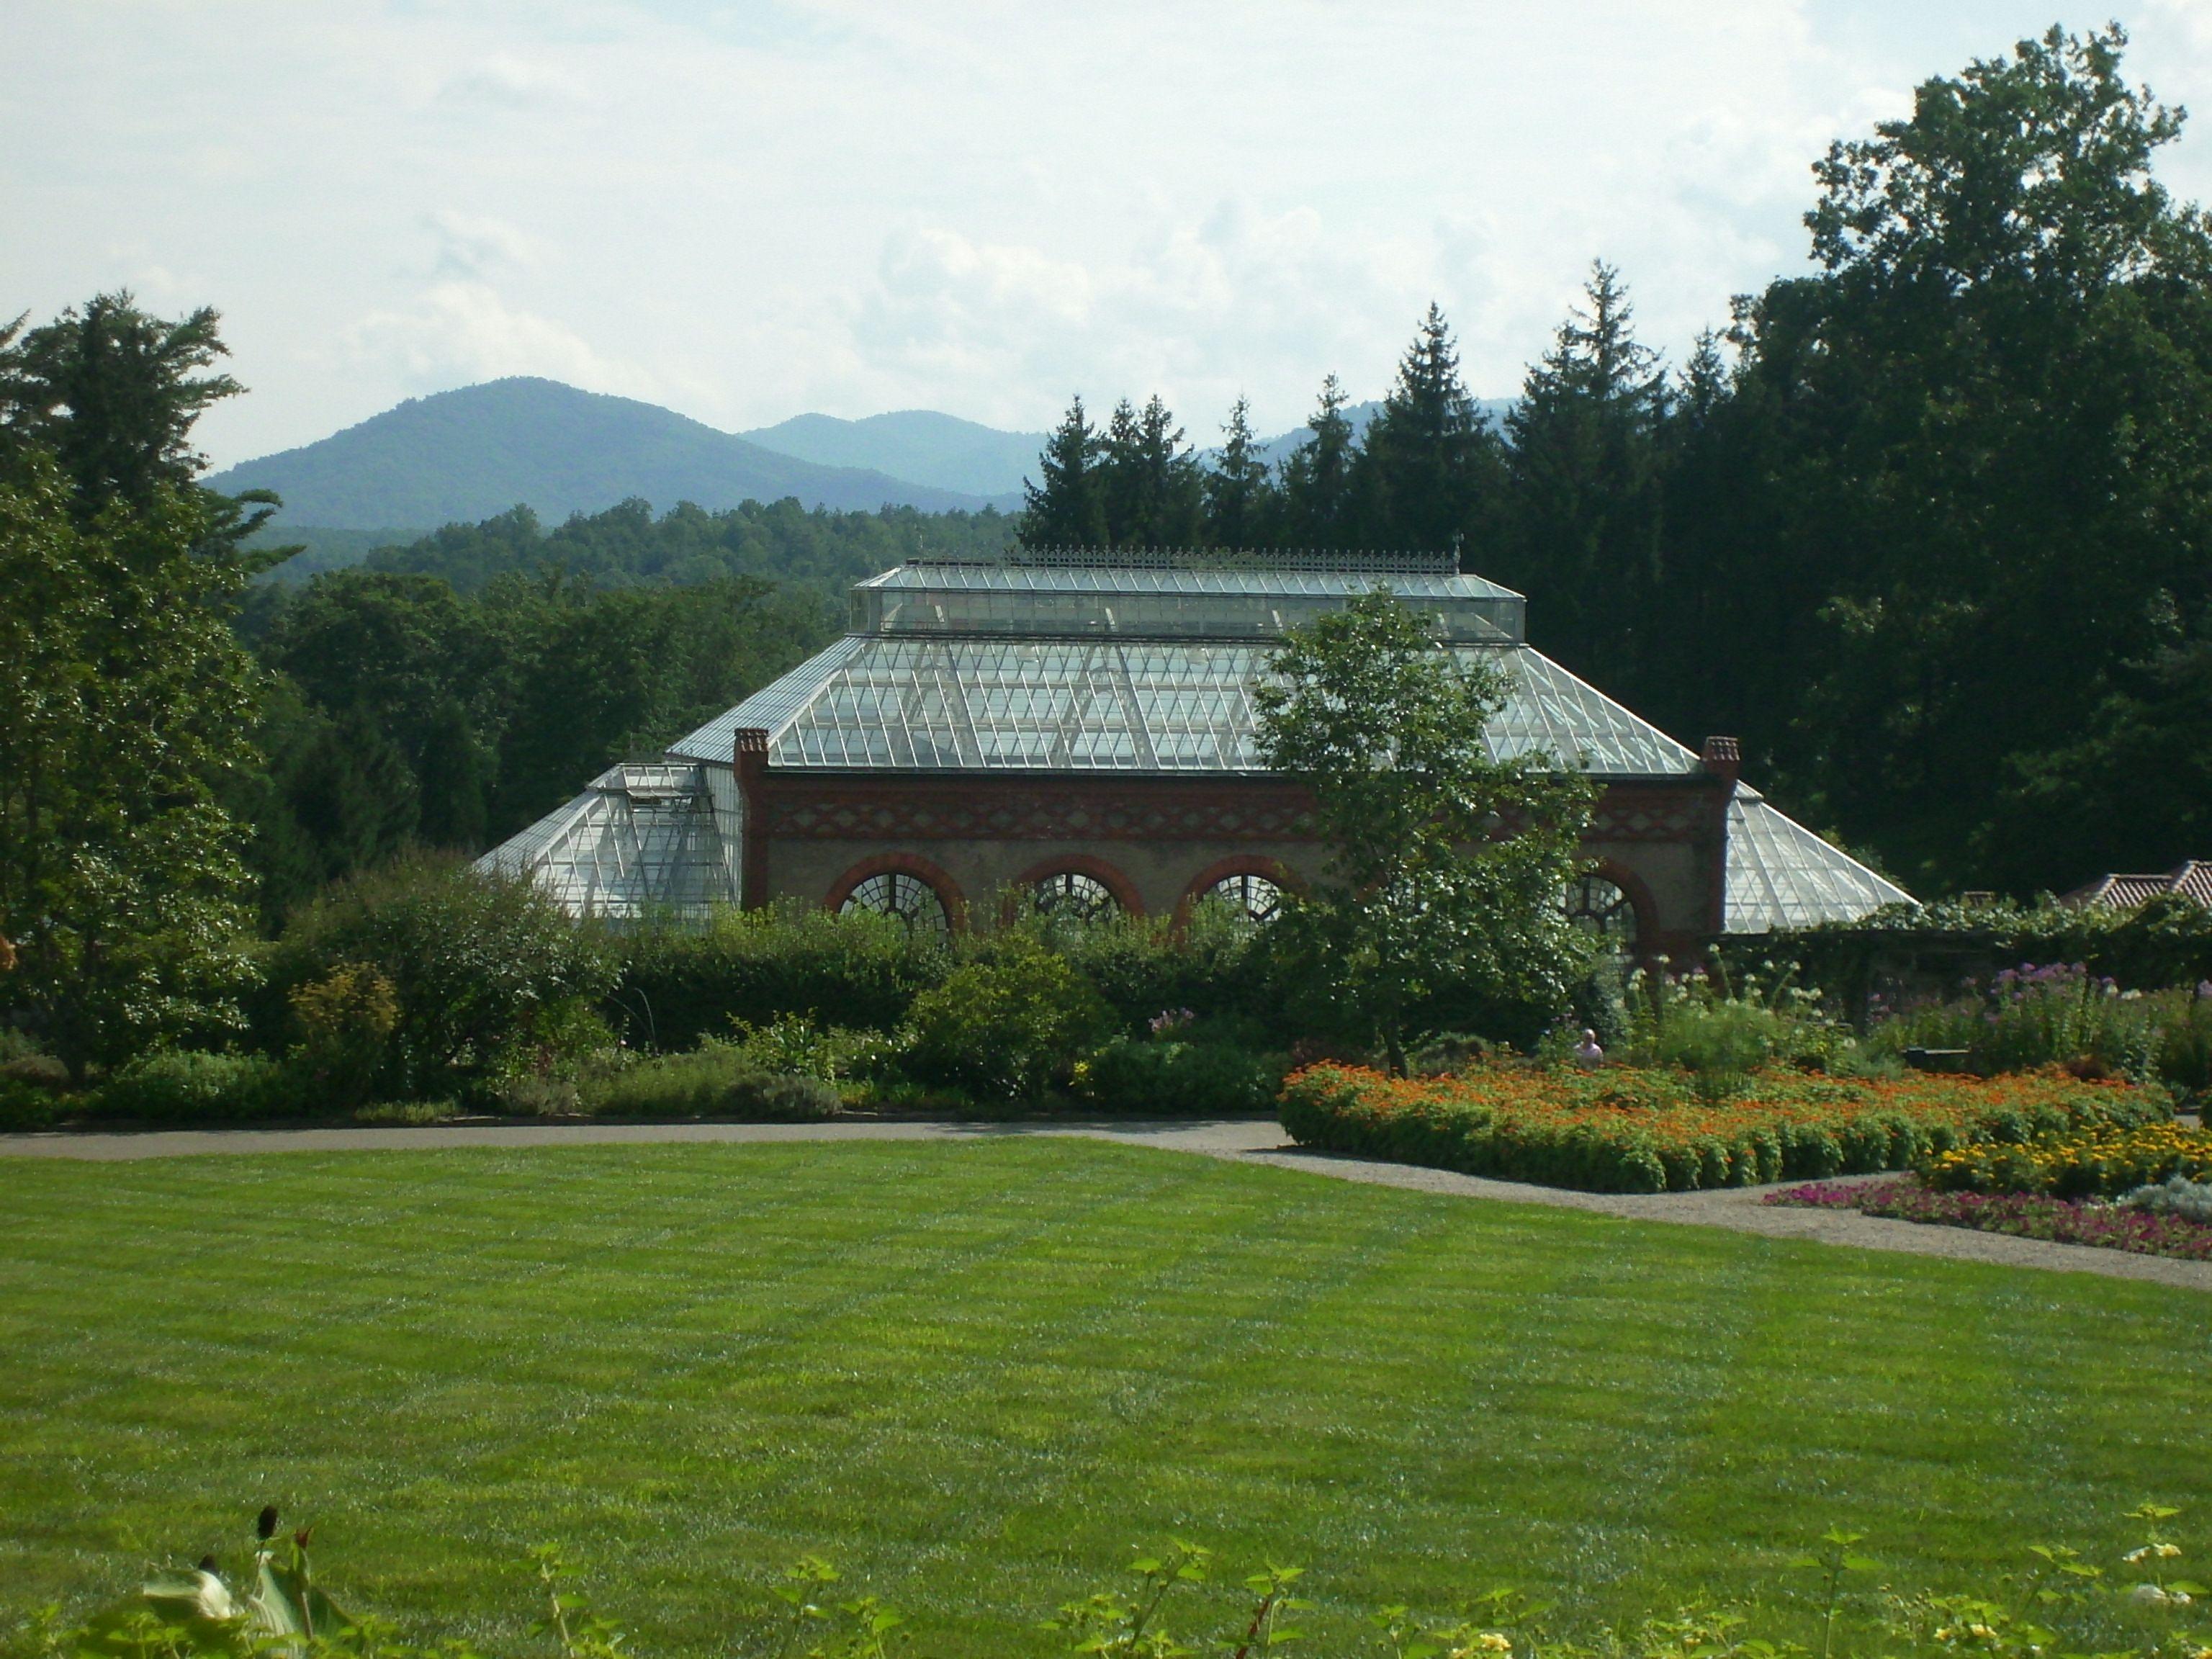 Conservatory at the Biltmore Estate, Asheville, NC